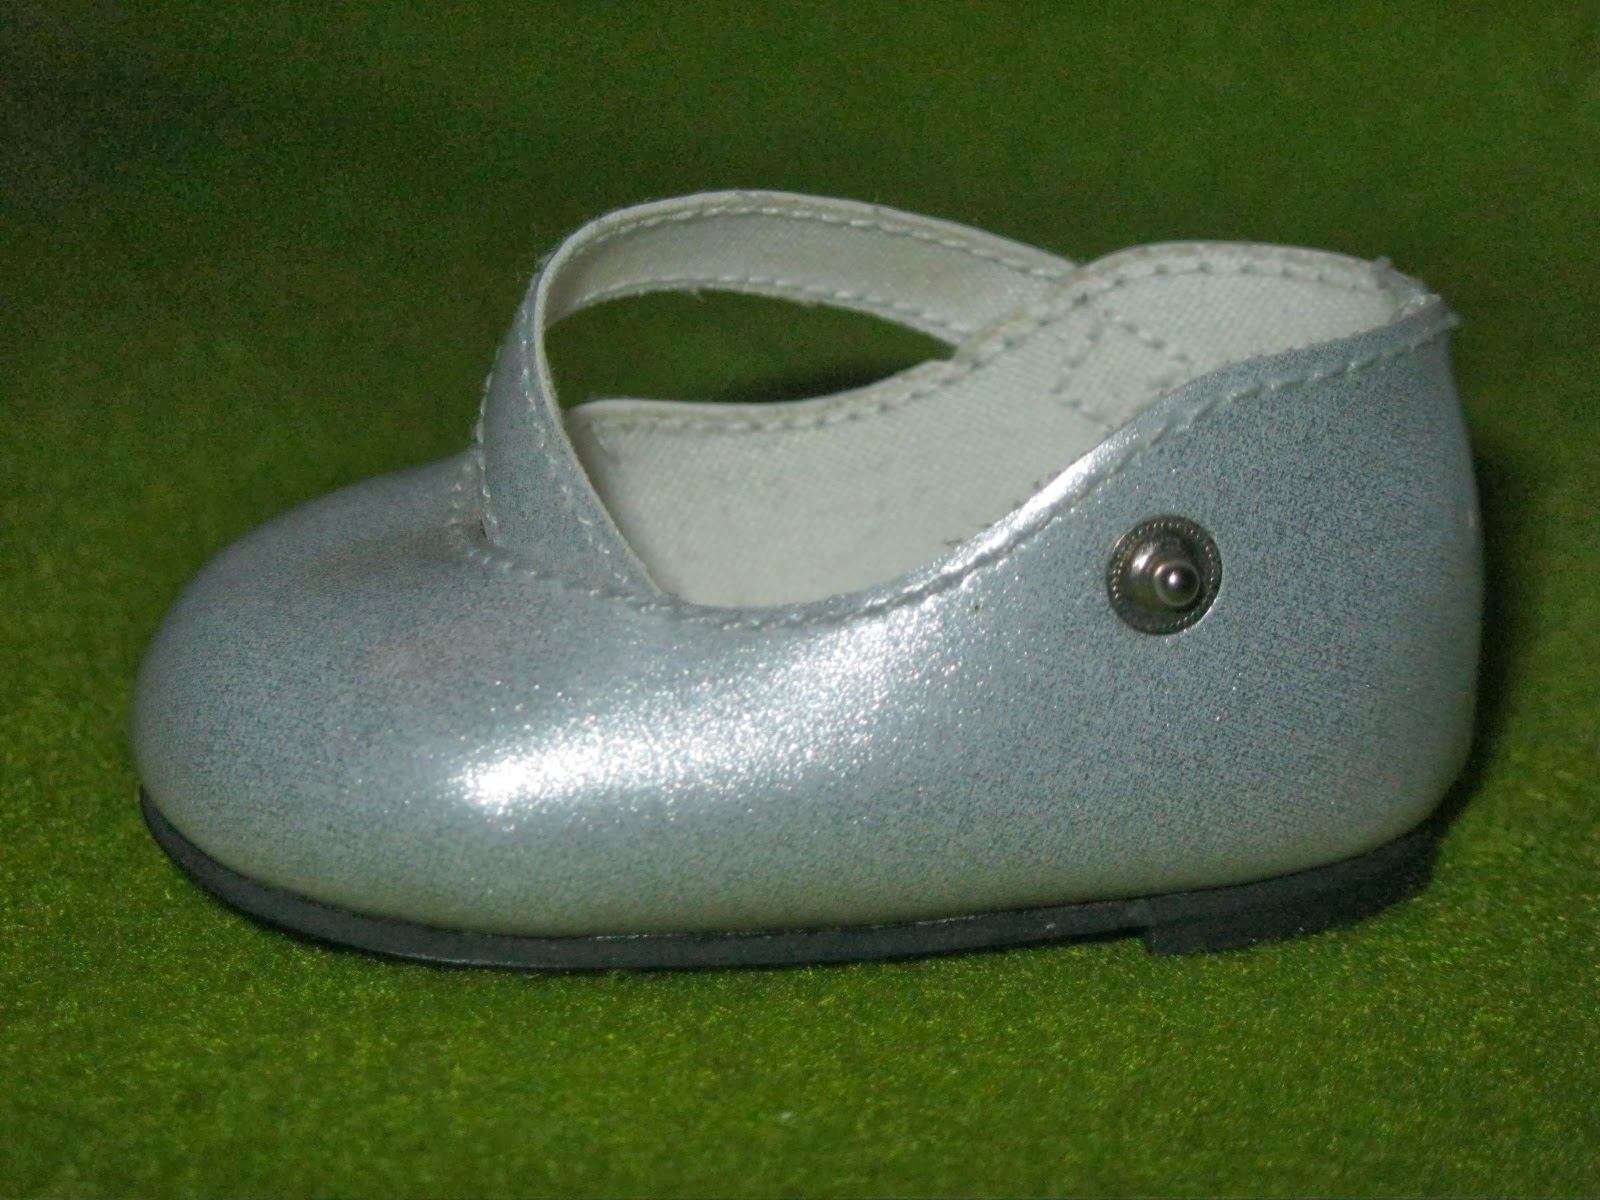 Silver Dance Shoes Uk